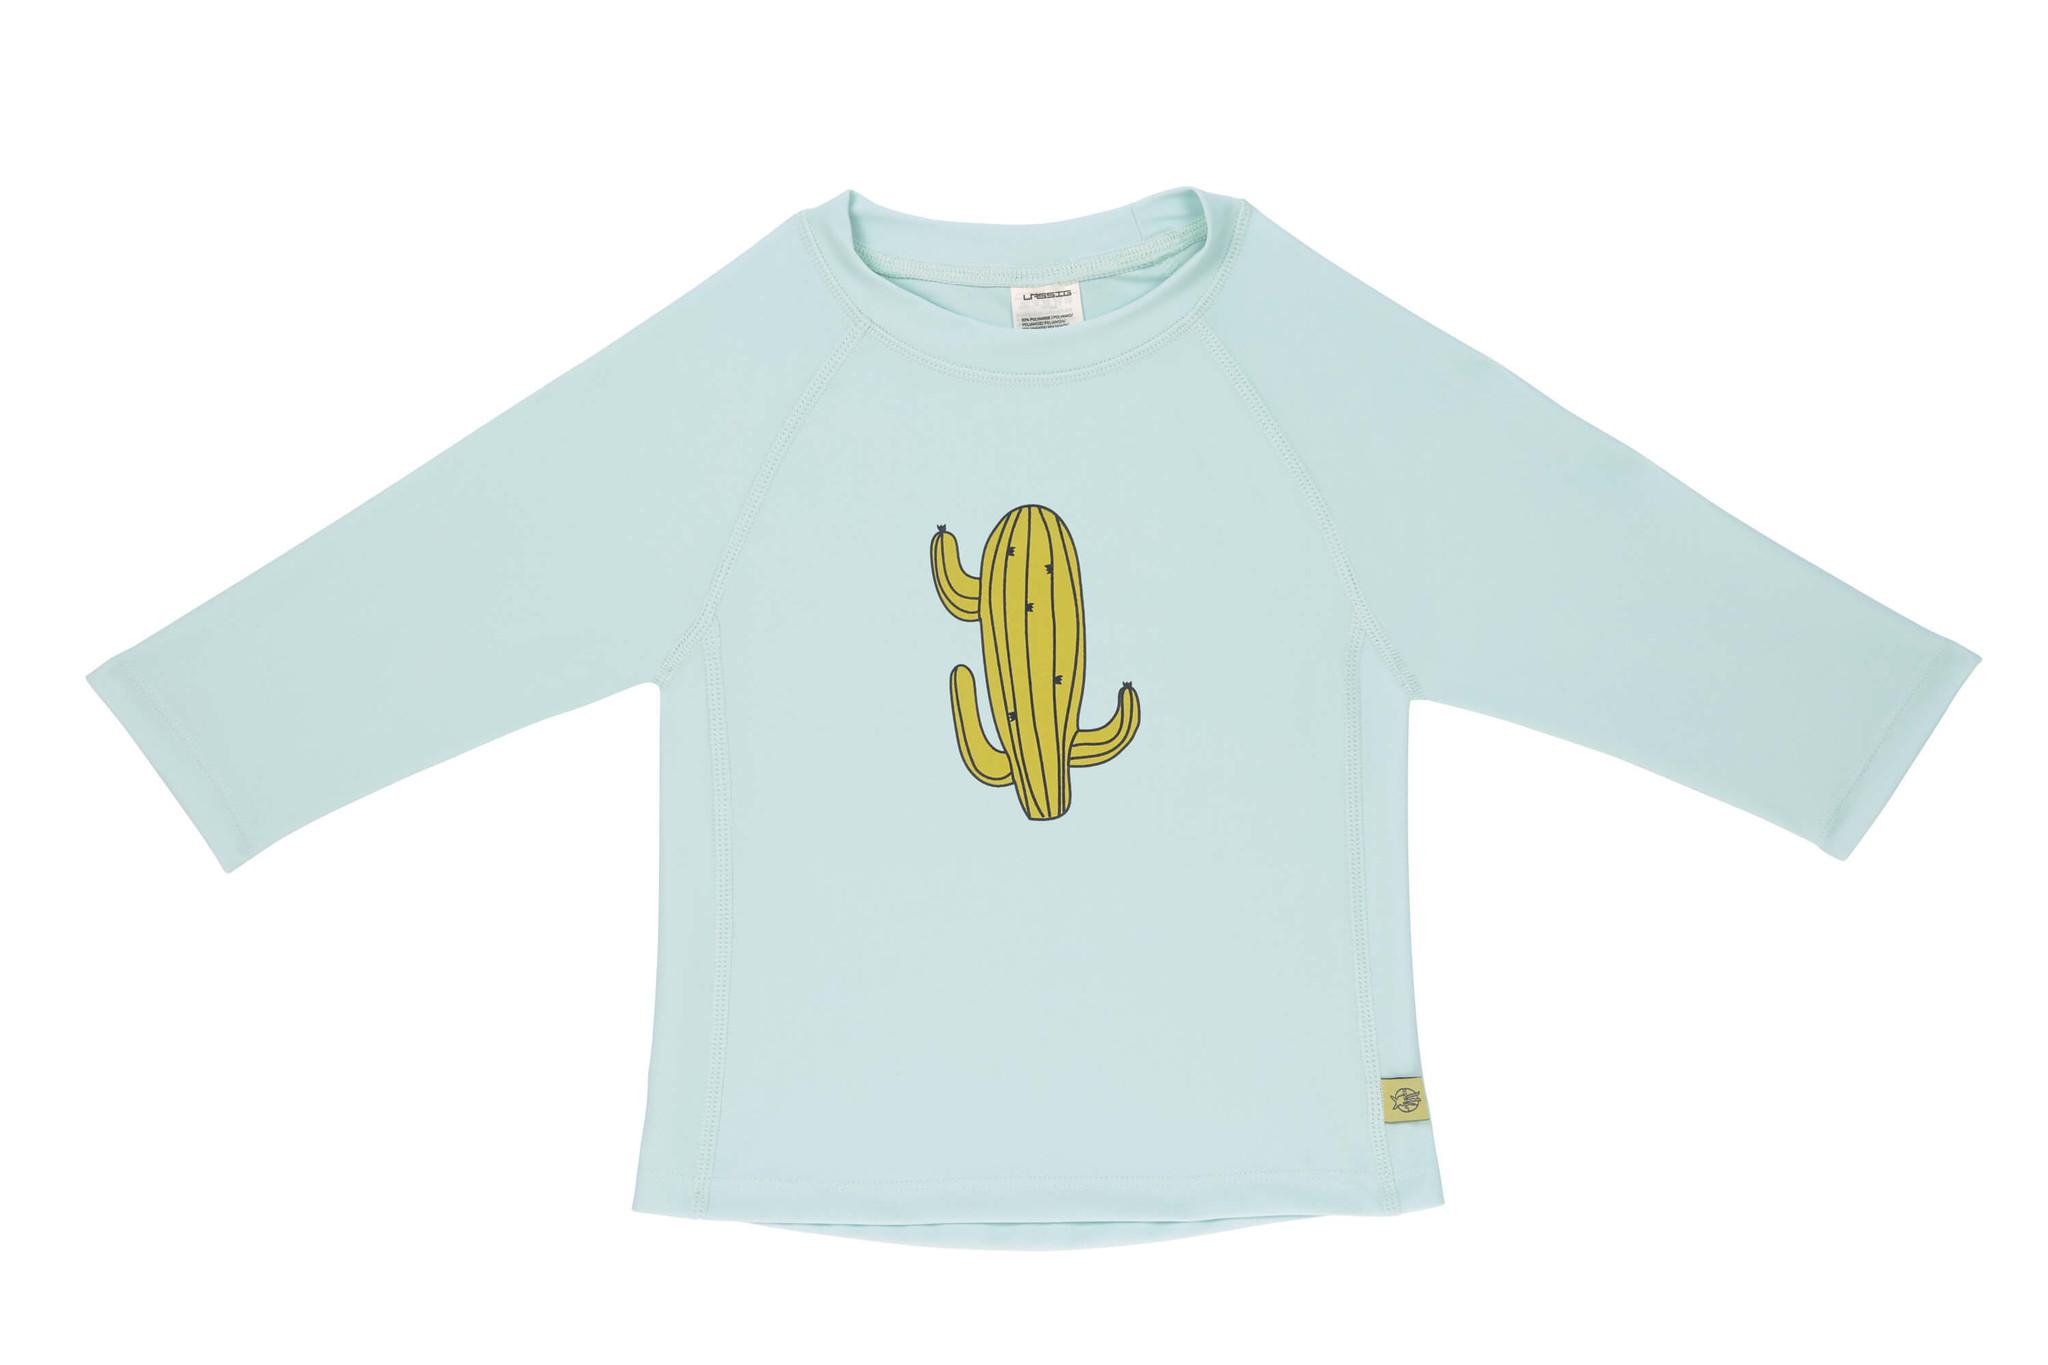 Lässig Lässig Splash & Fun Lange mouw Rashguard / zwemshirt - Cactus Family